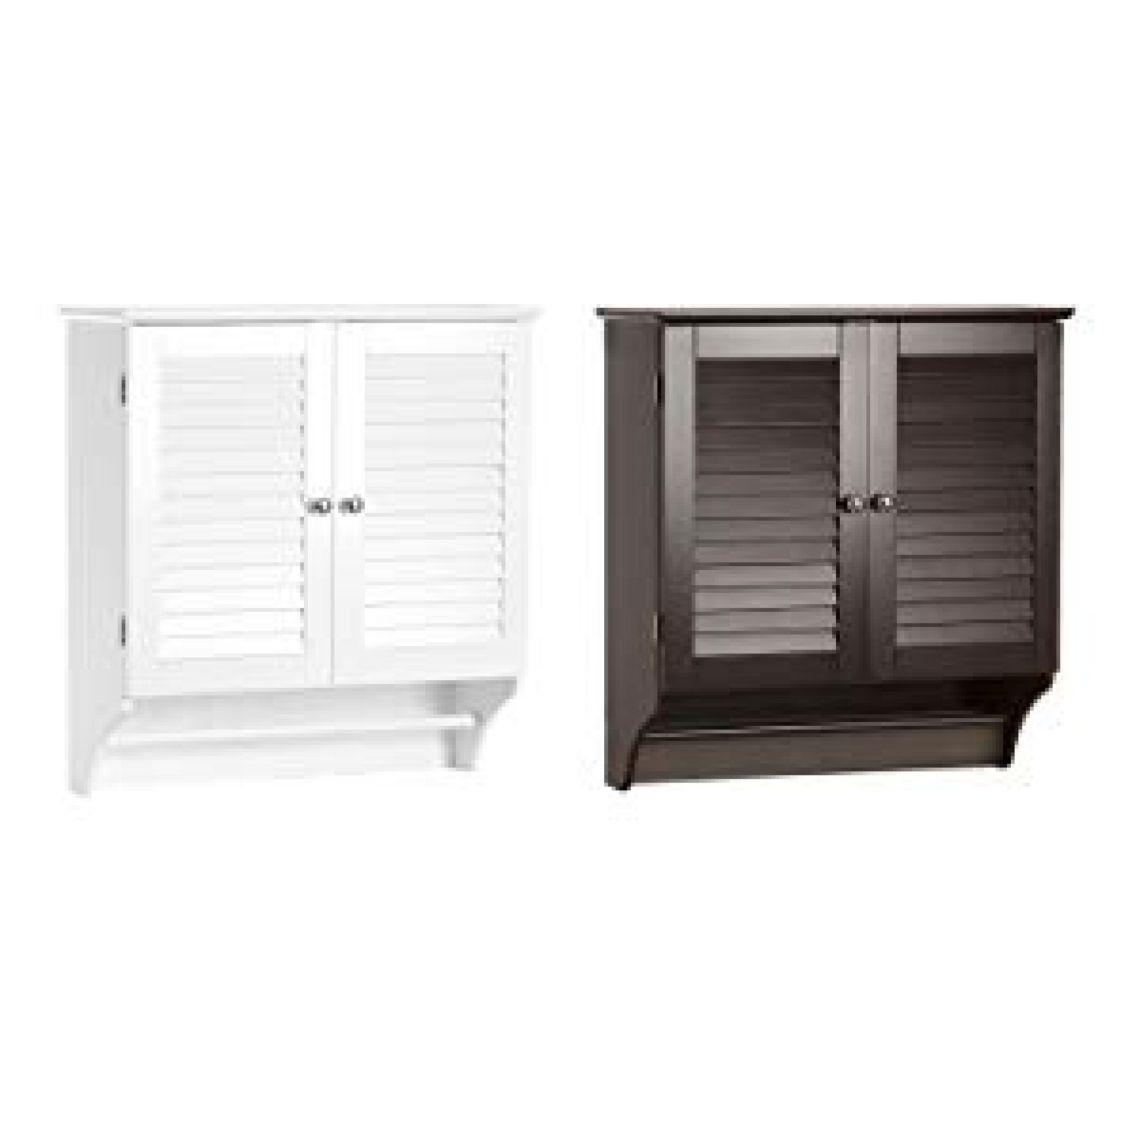 Amazon.com: RiverRidge Ellsworth Collection Two-Door Wall Cabinet, White: Kitchen & Dining